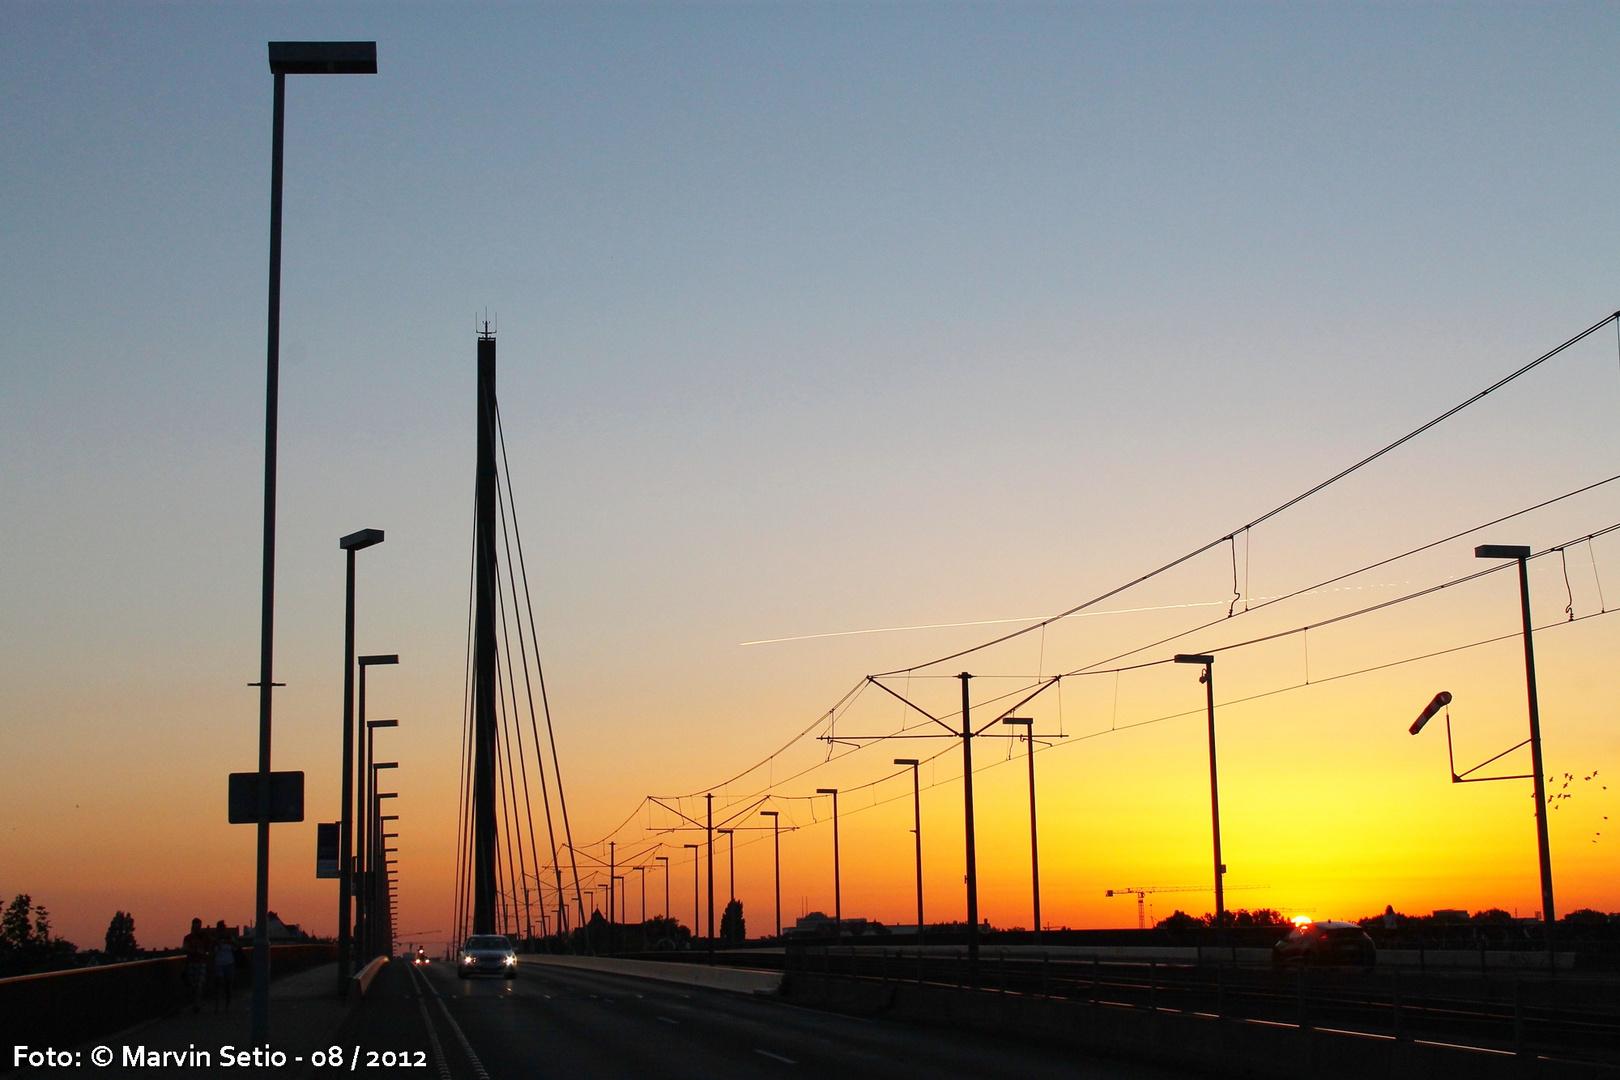 Oberkasseler Brücke & Sonnenuntergang